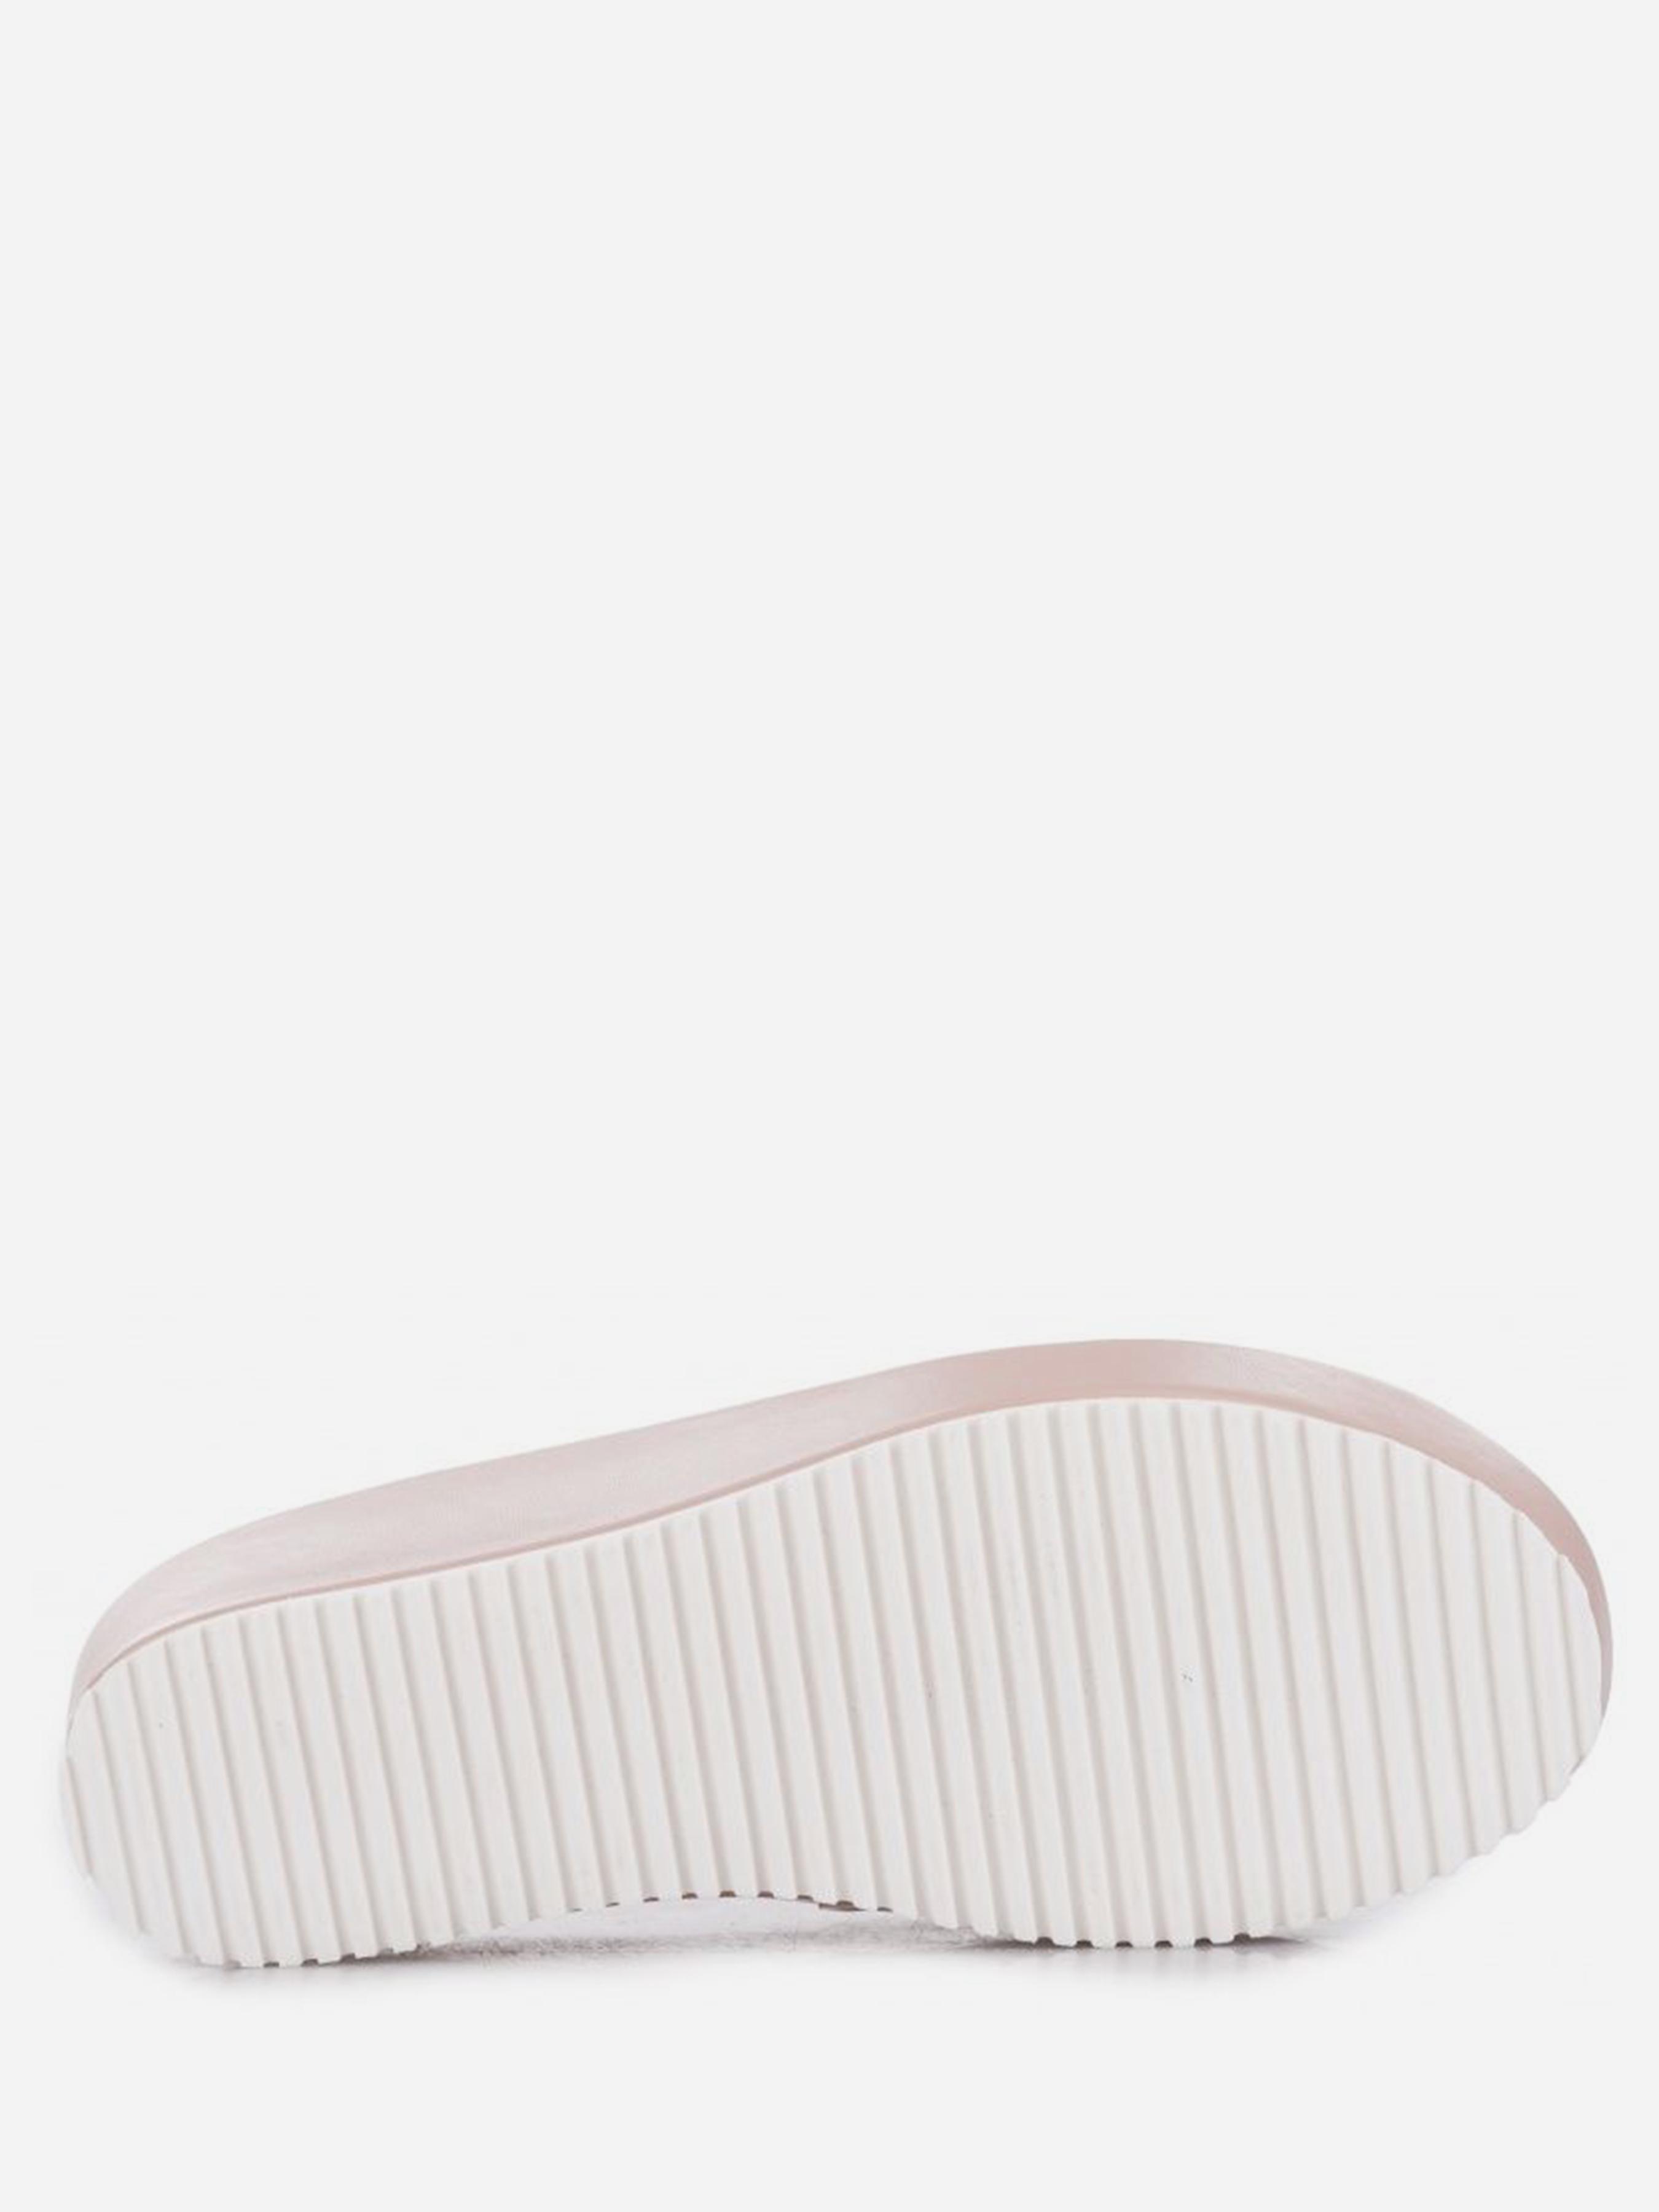 Шлёпанцы женские Braska BS3054 брендовые, 2017